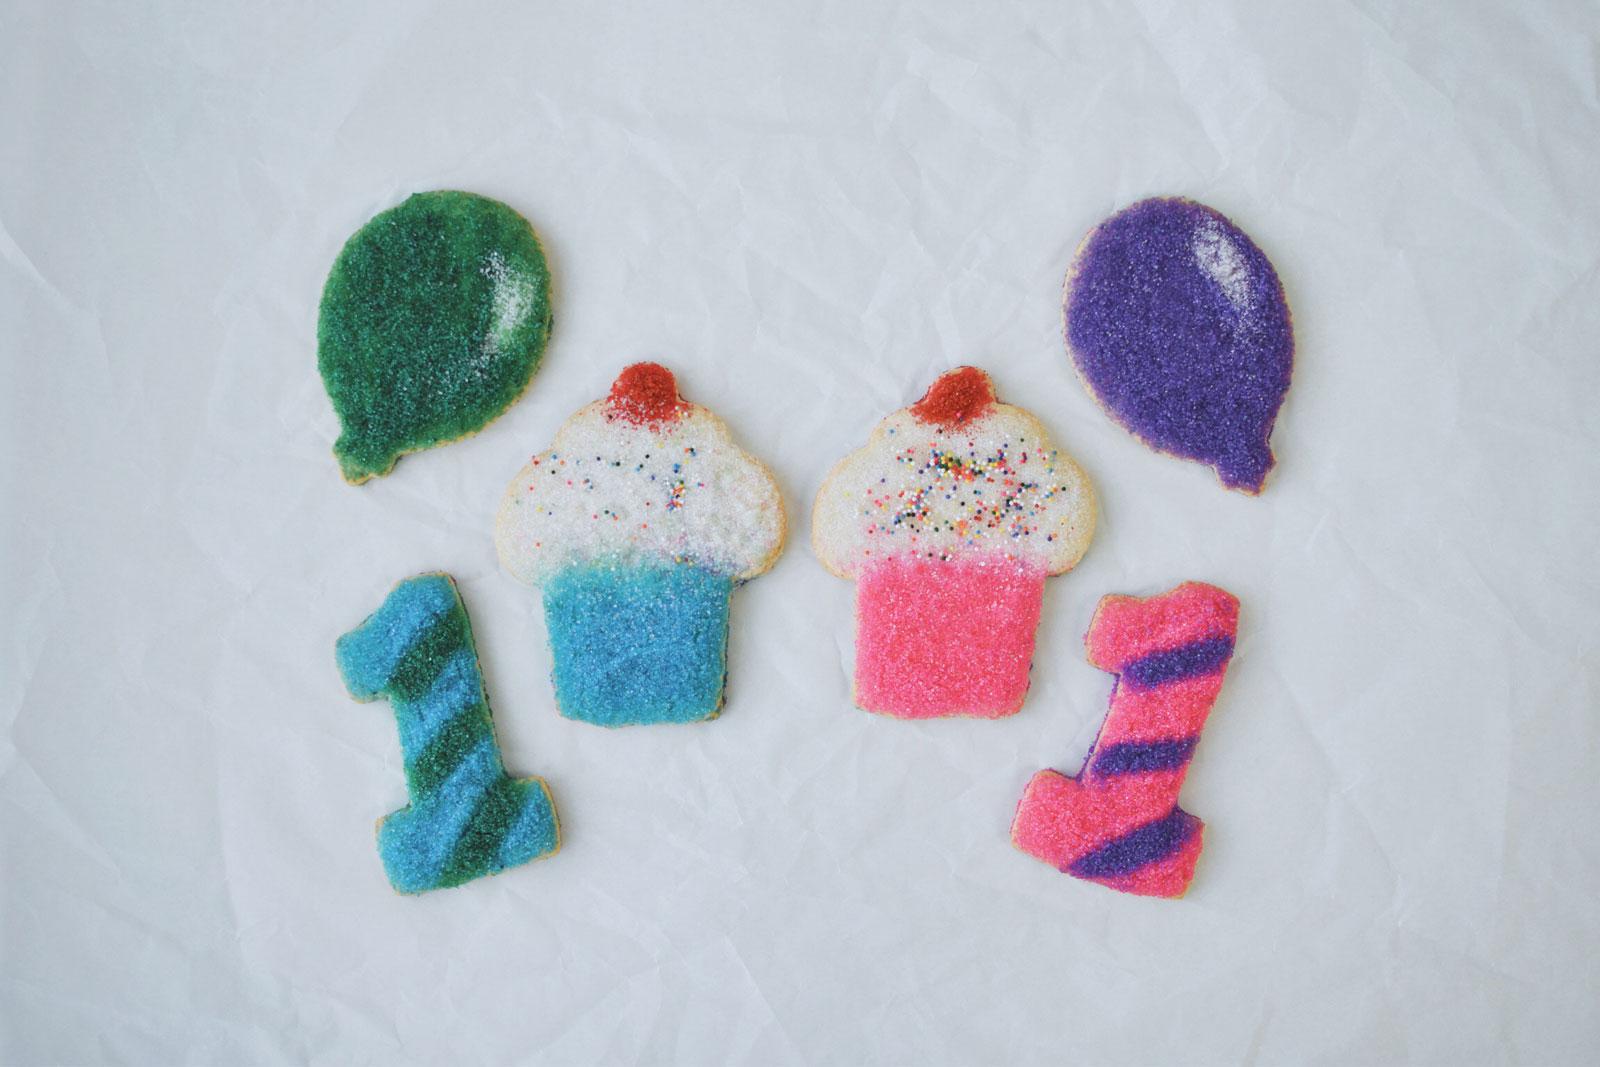 Sanding Sugar Birthday